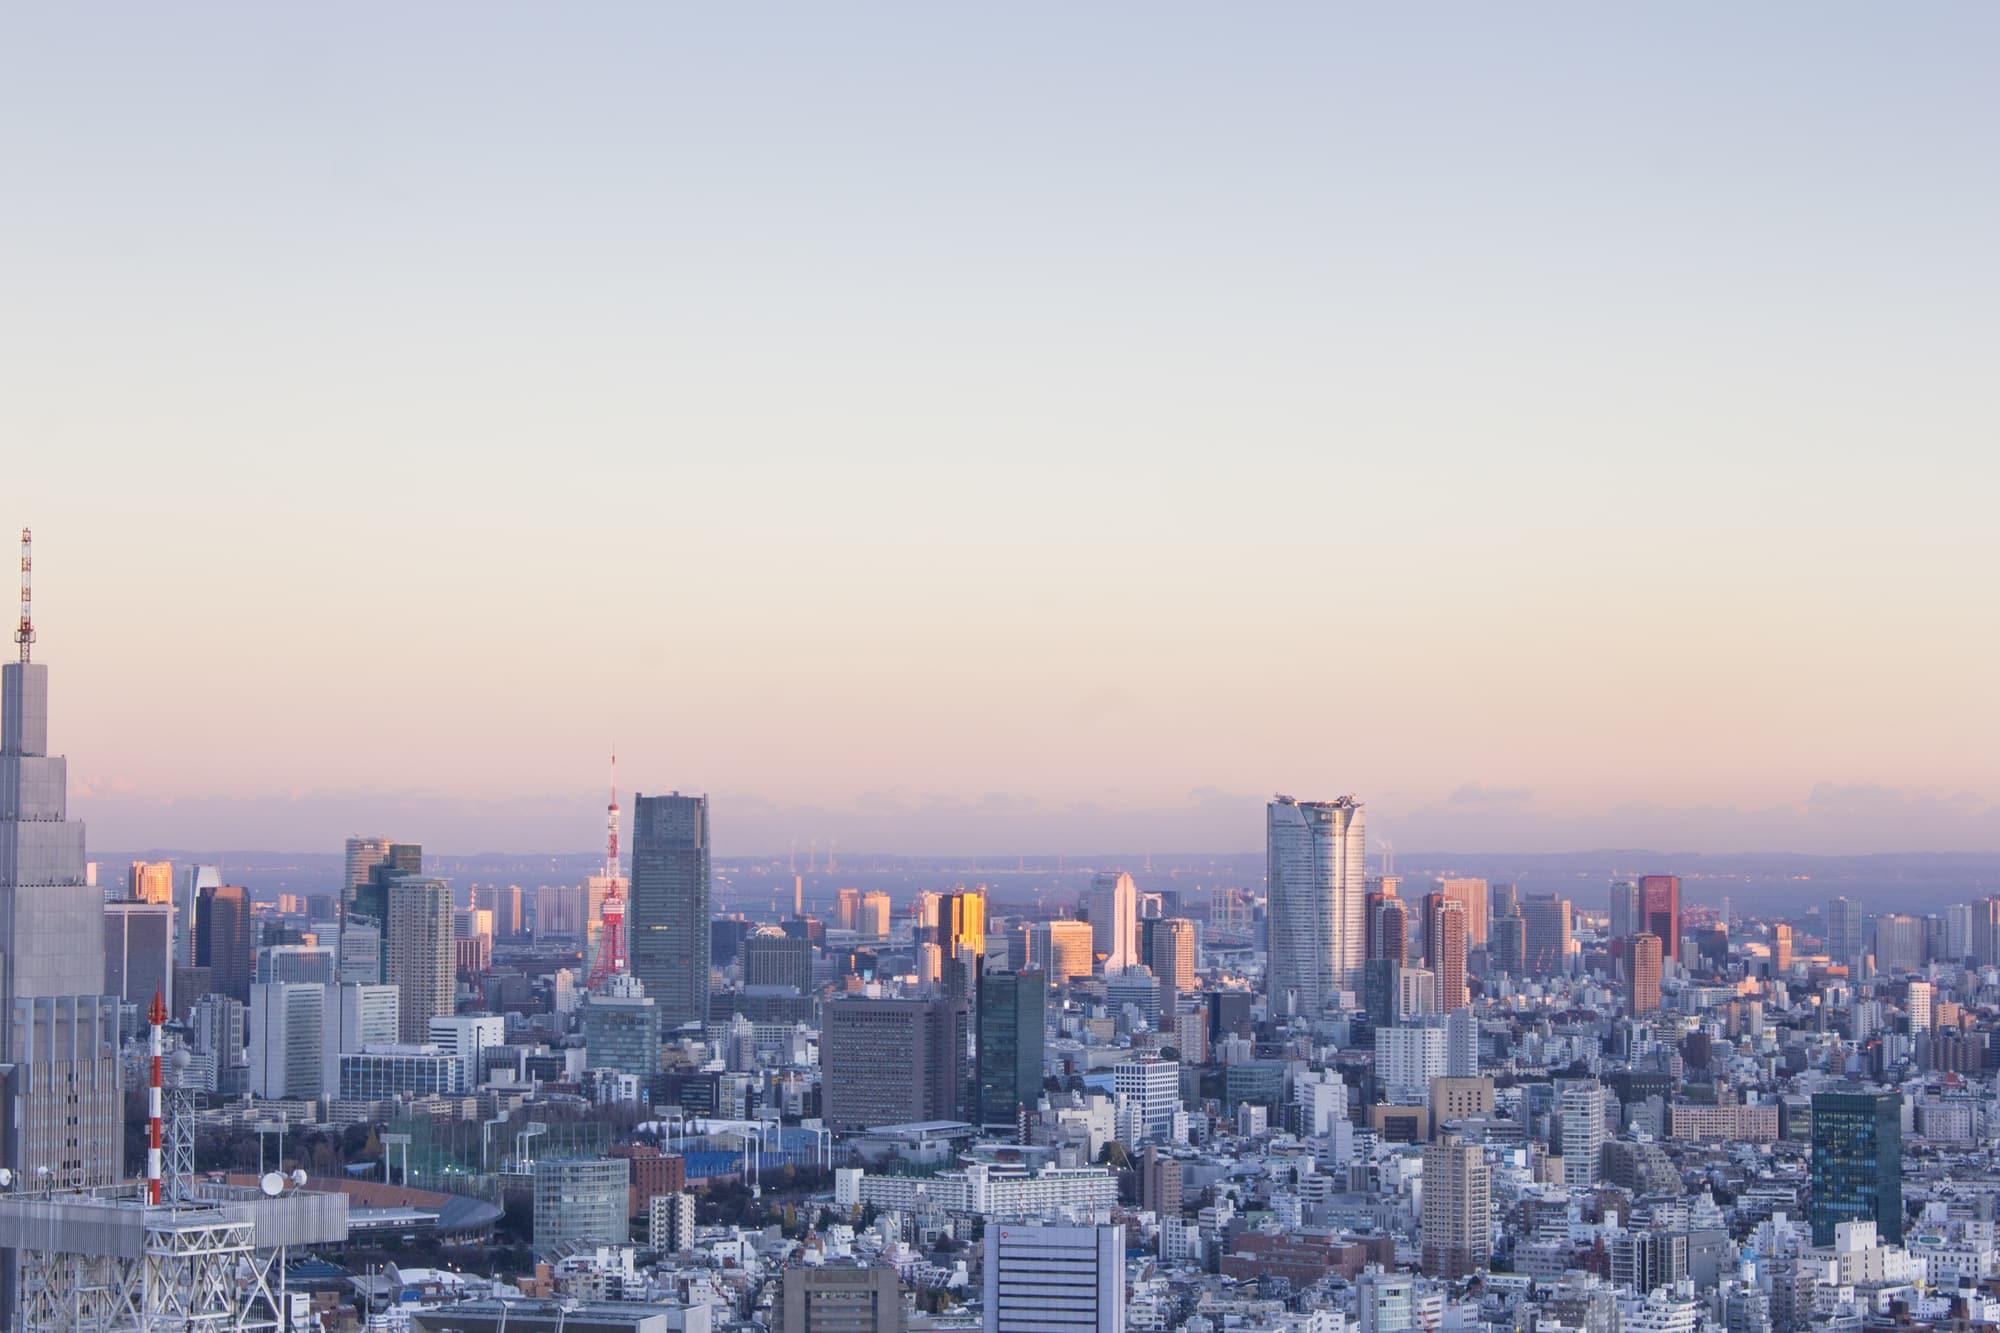 Mr. Makoto Shinkai's Gallery - From「HOSHINOKOE」To「KIMINONAWA.」 -